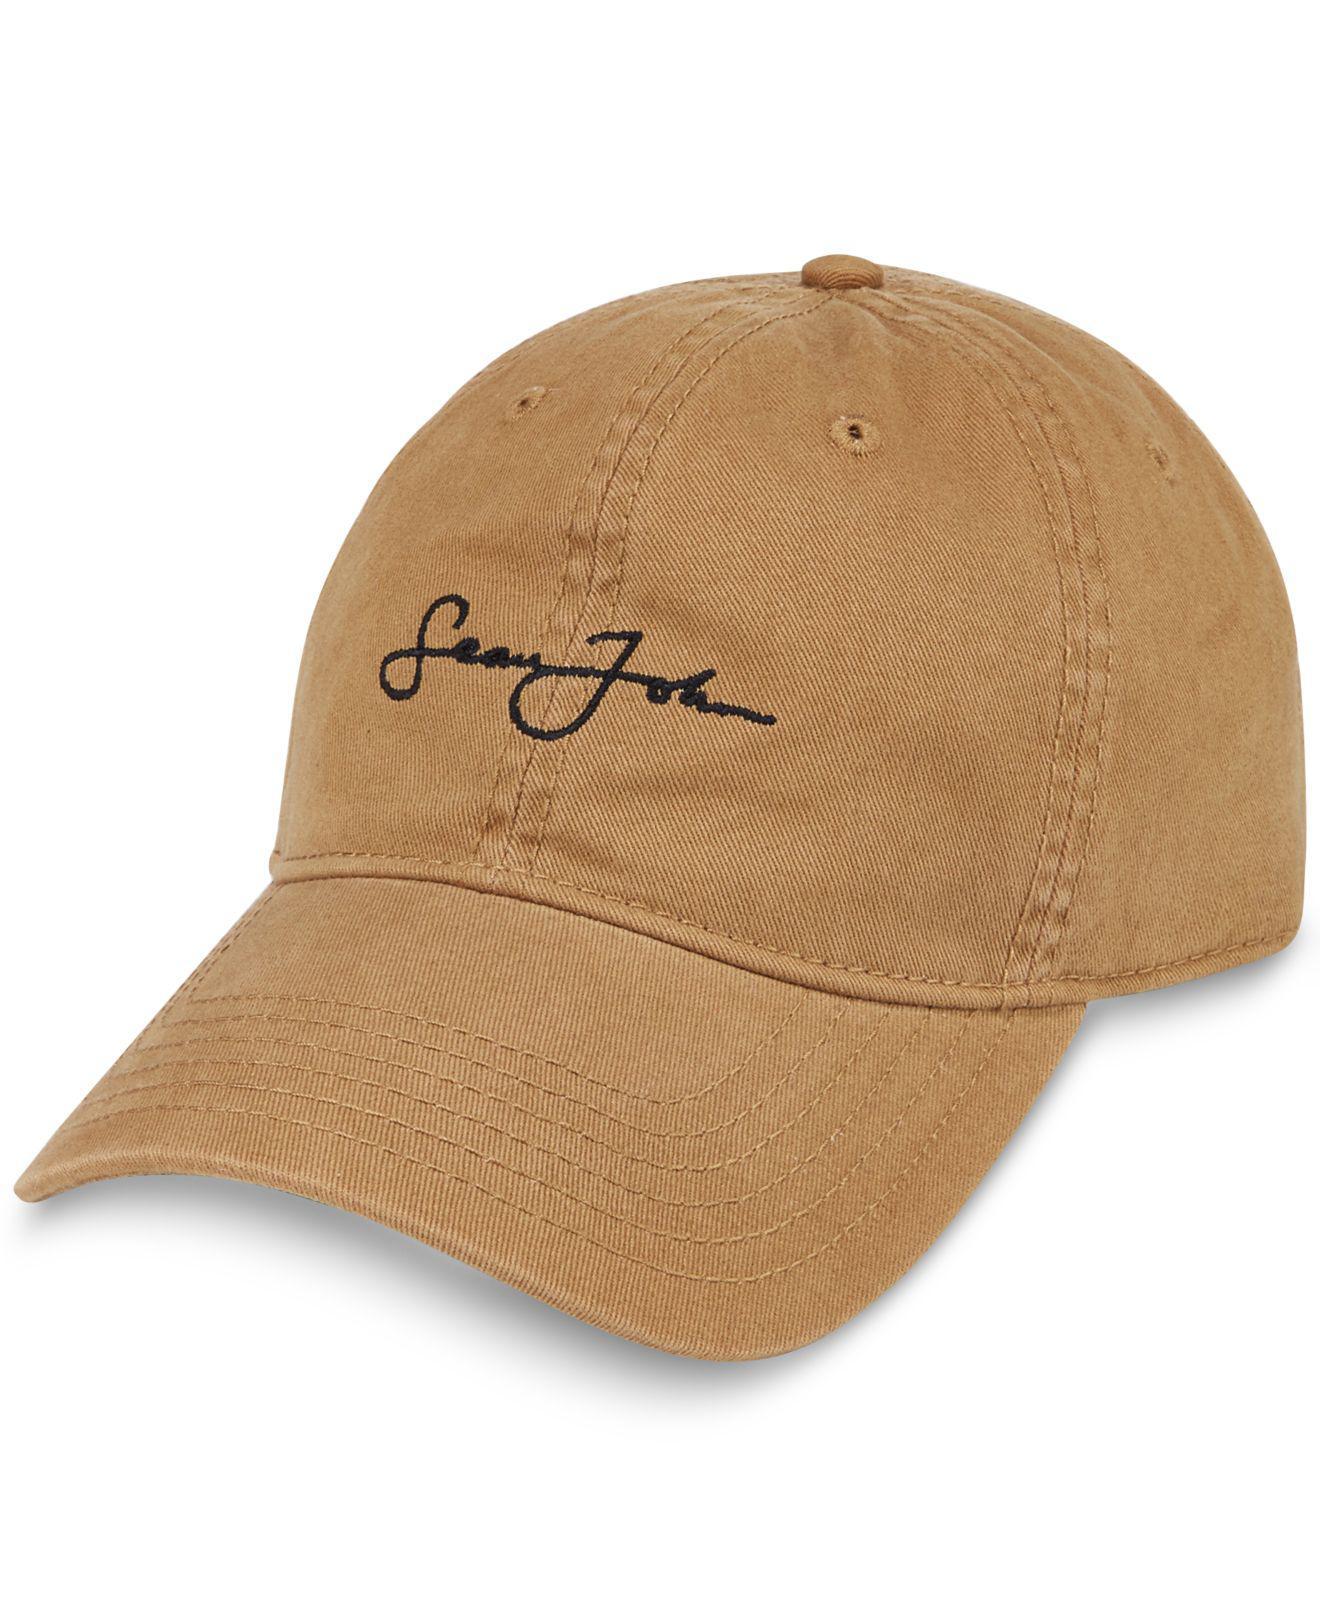 15239bd8a74 Lyst - Sean John Men s Textured Cap in Orange for Men